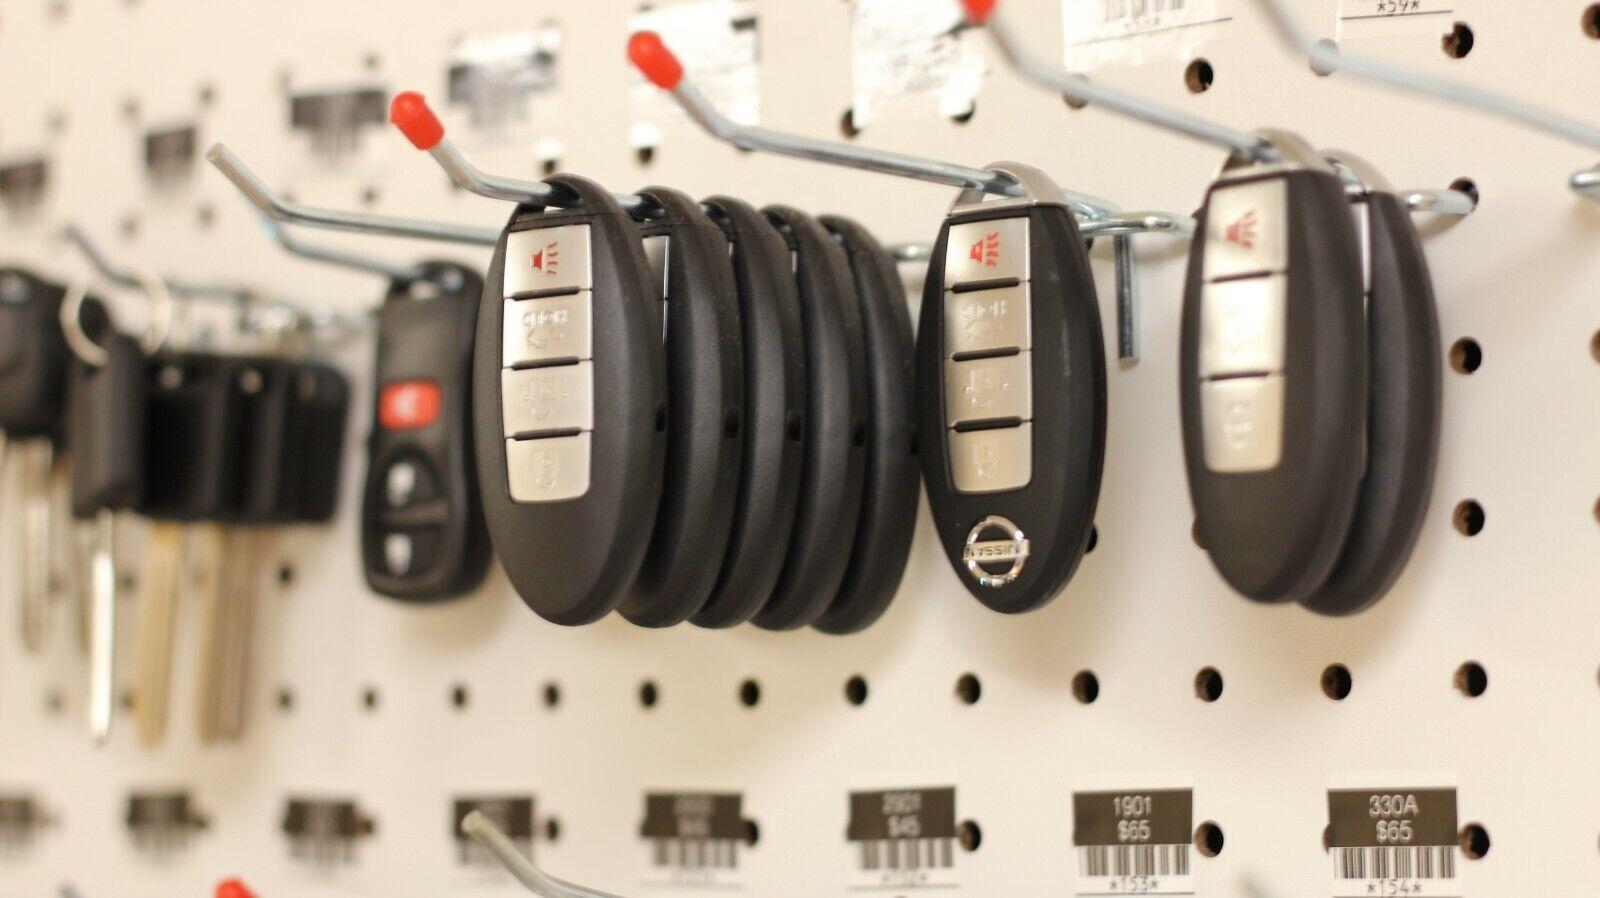 Licensed Locksmith. 1121-1160 keys for Trimark RV Camper locks key cut to code